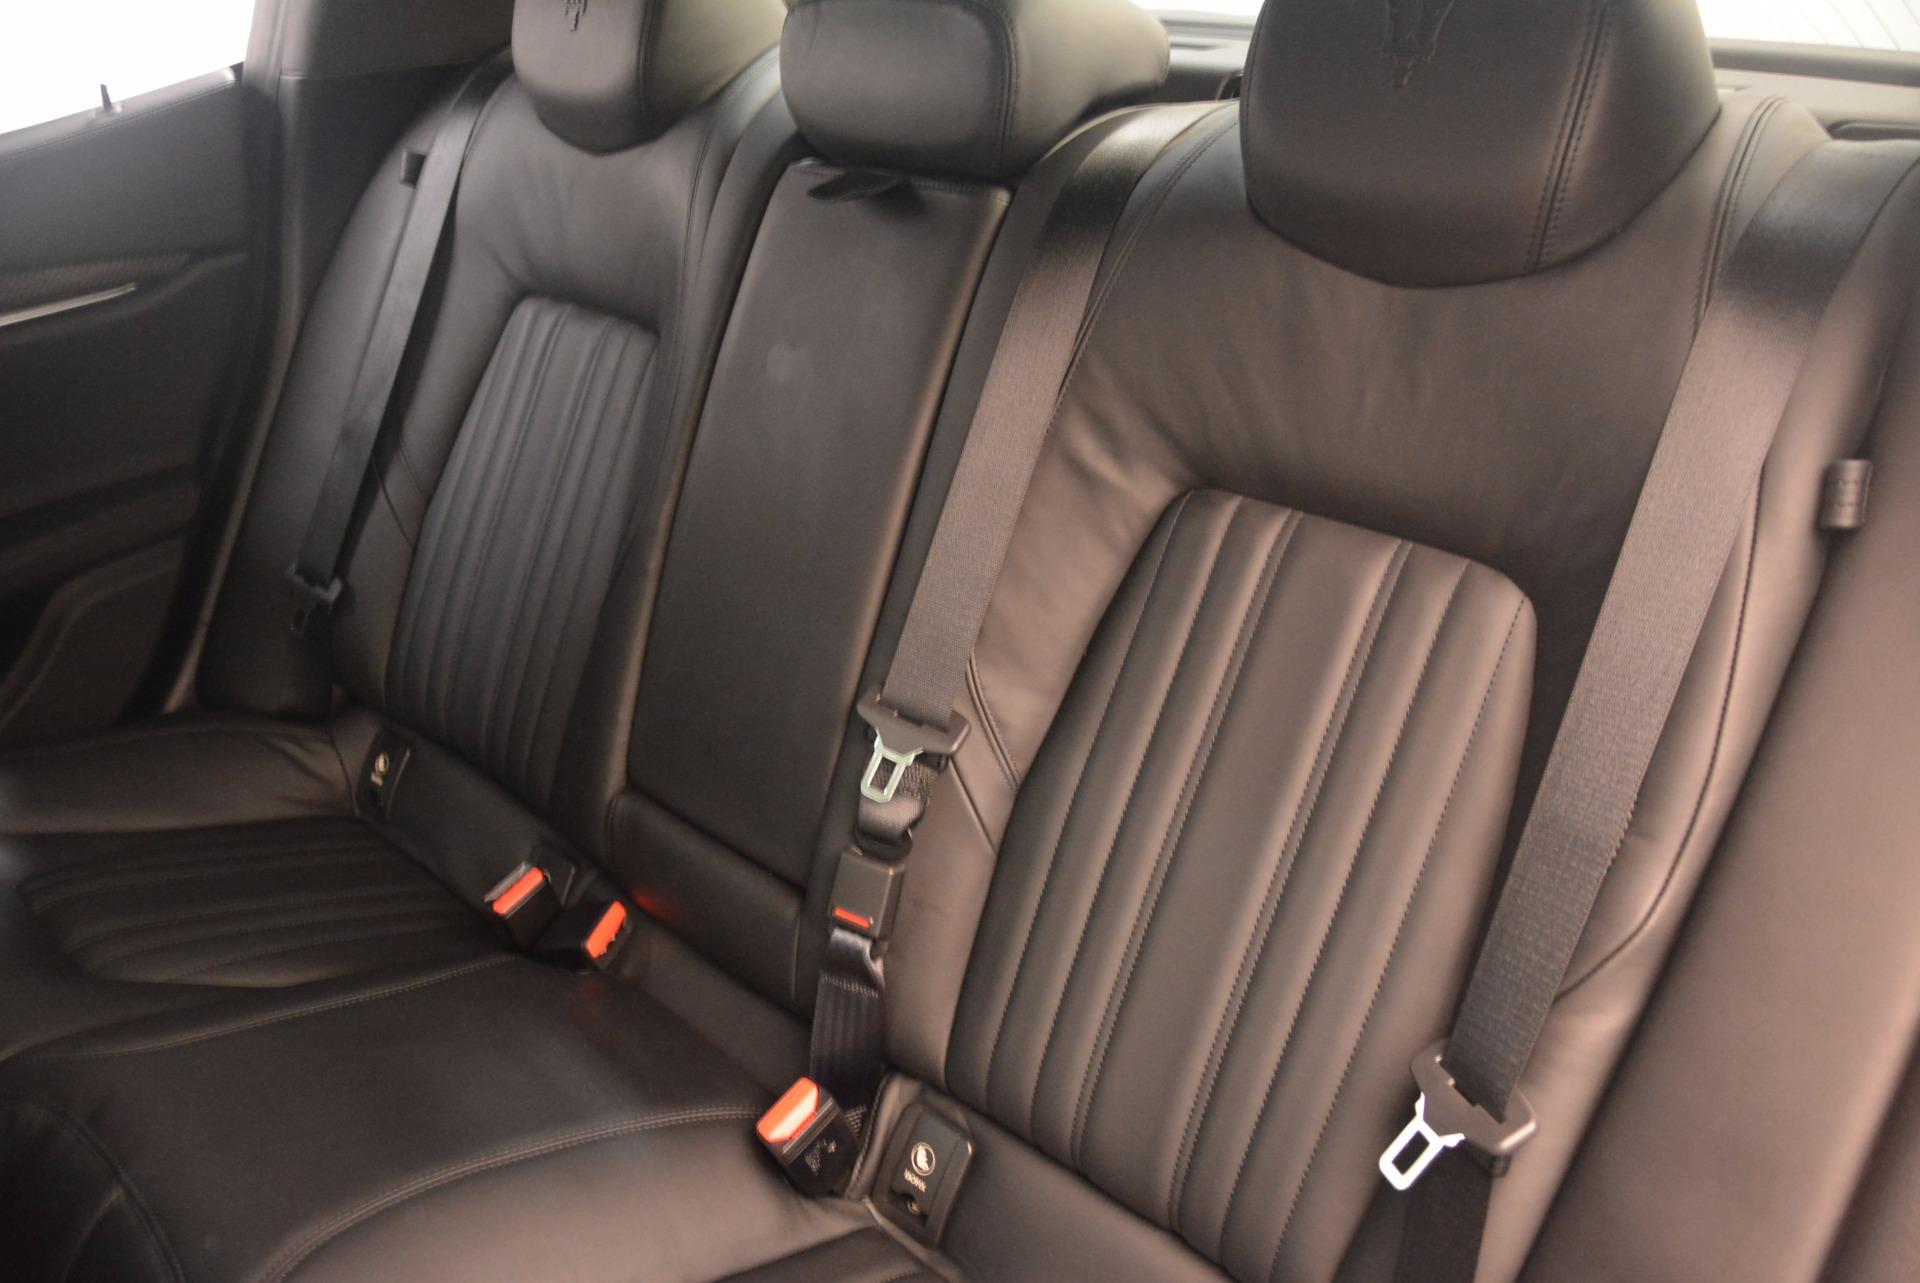 Used 2014 Maserati Ghibli S Q4 For Sale In Greenwich, CT. Alfa Romeo of Greenwich, 7203 1158_p18